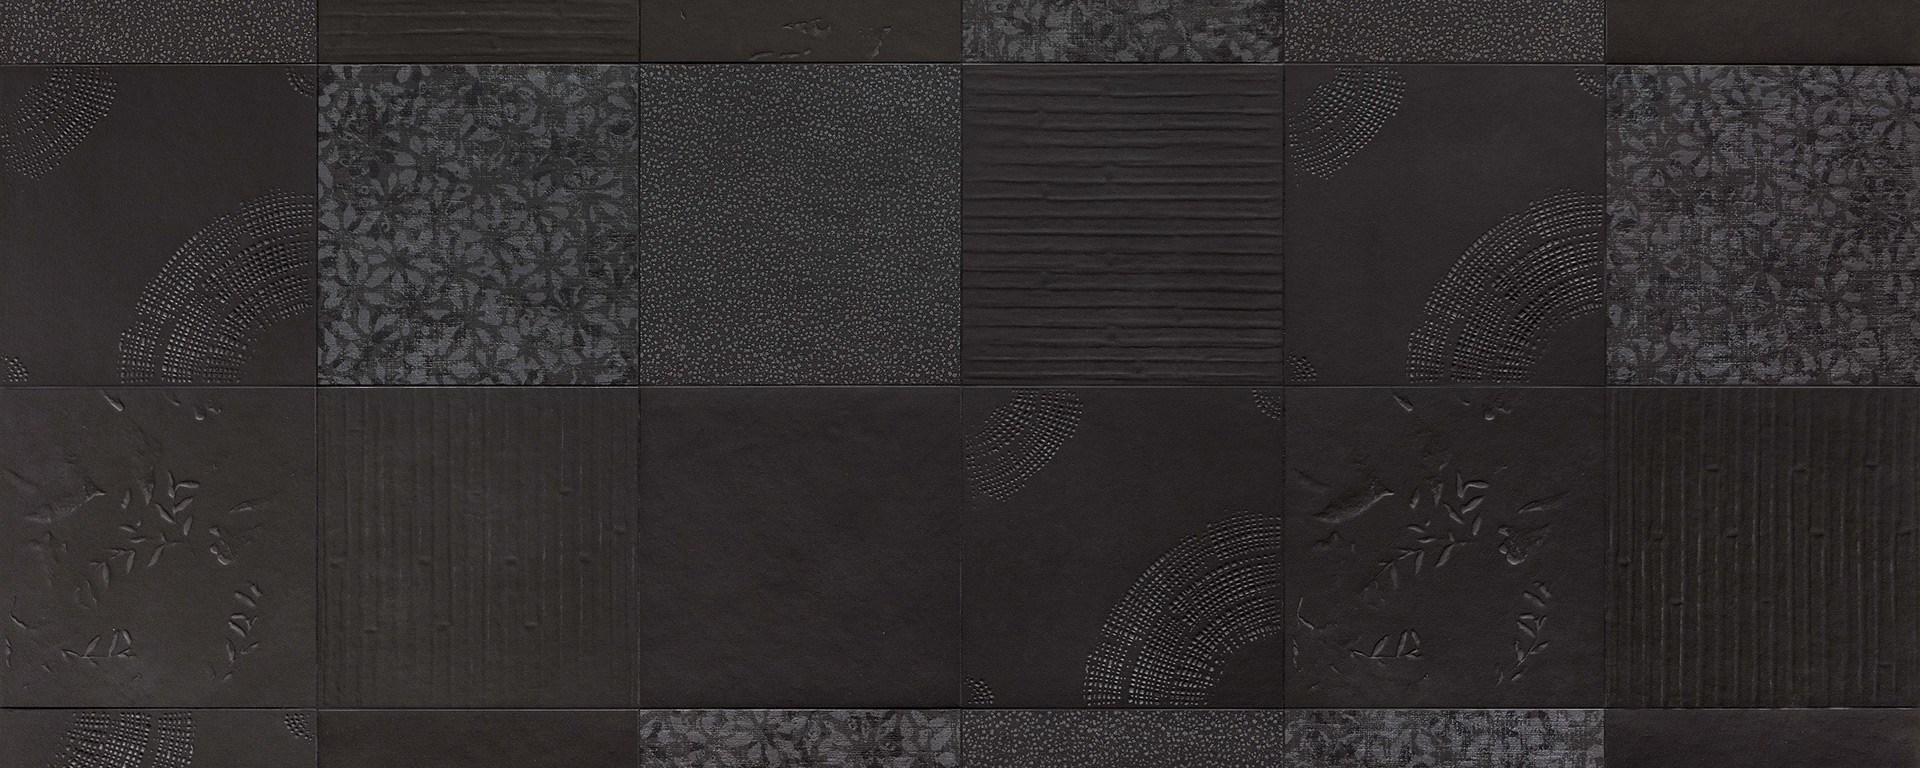 Mutina Chymia black and white tile range cersaie 2019